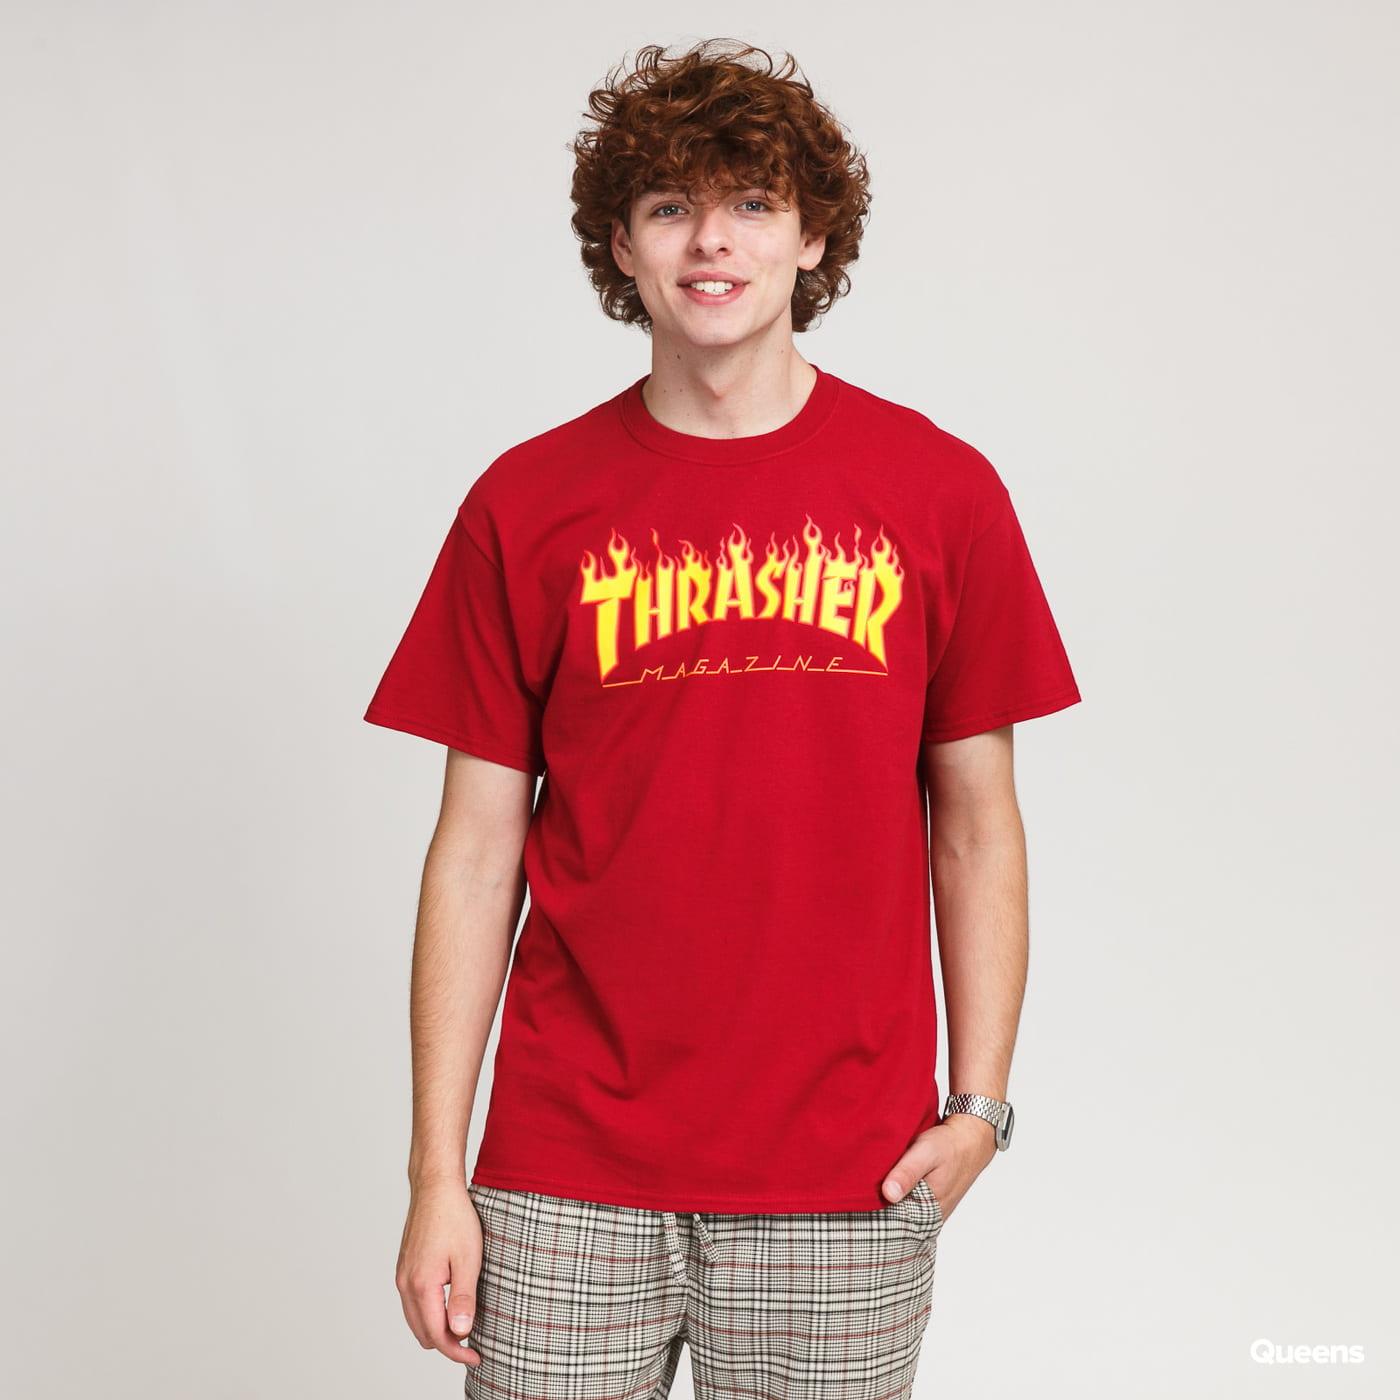 Thrasher Magazine Flame T-Shirt Authentic Flame Logo Short Sleeve Top Tee